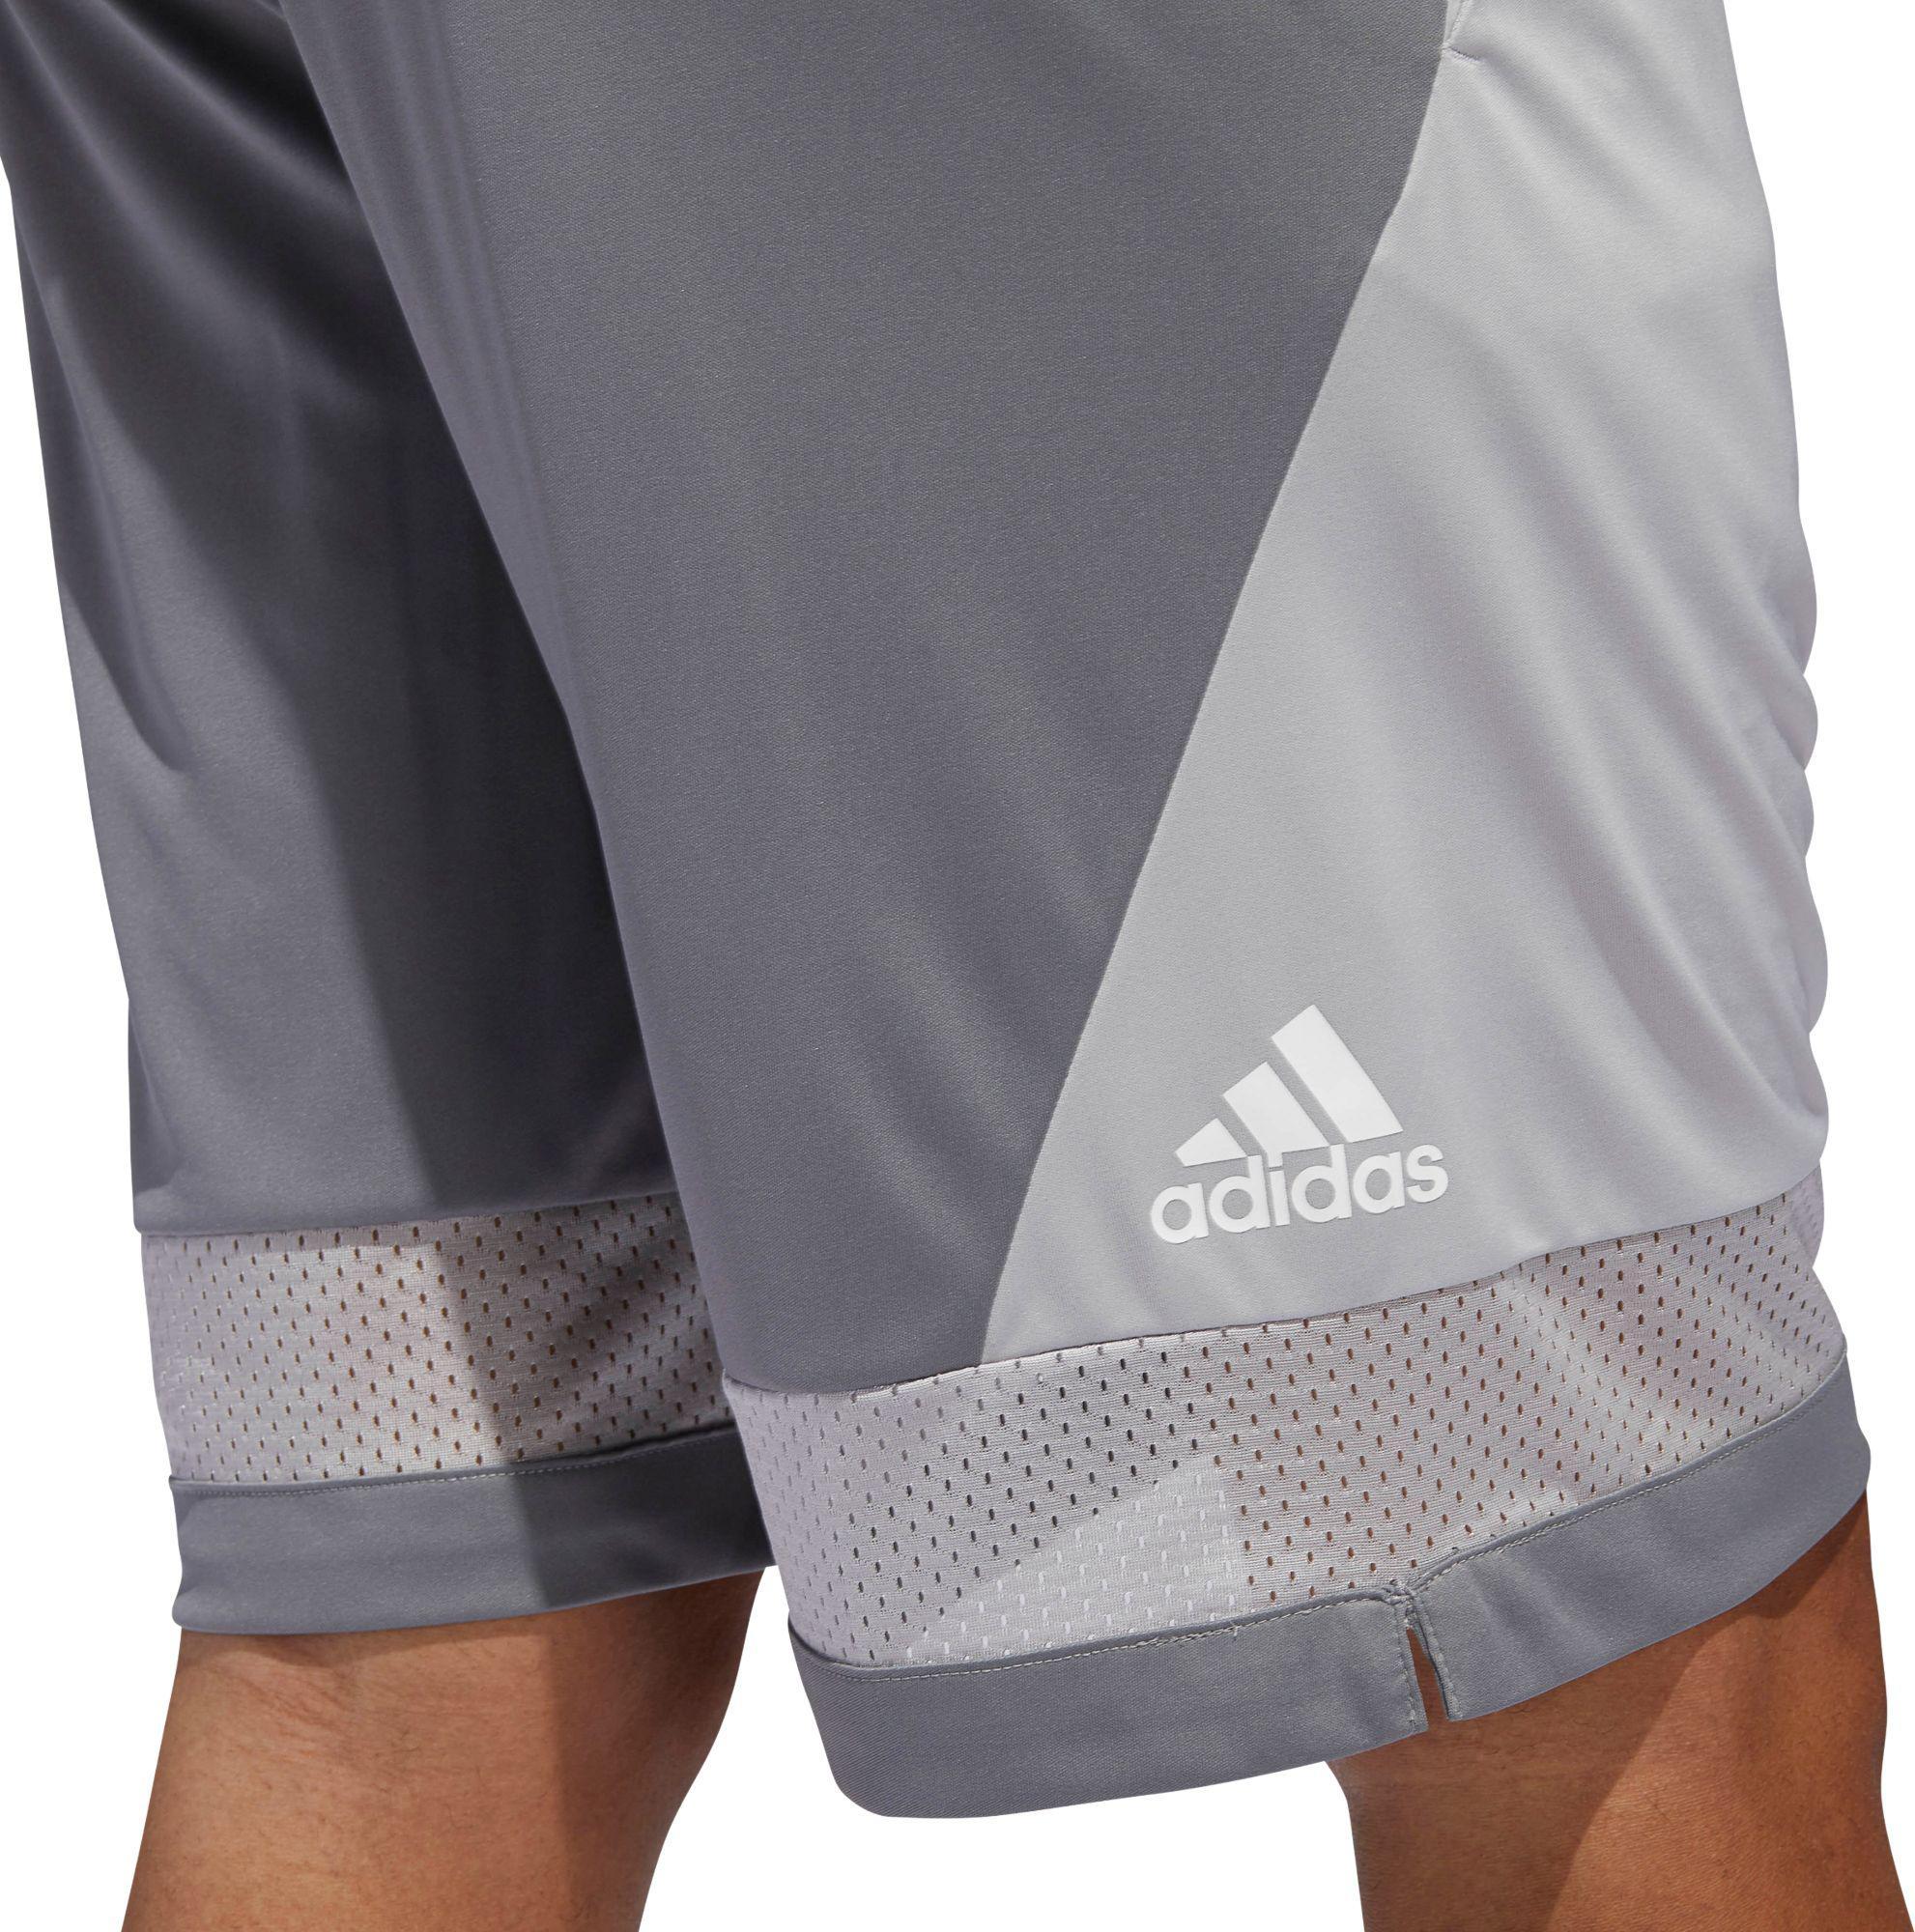 a5ae4bb03957 Adidas - Gray Pro Bounce Basketball Shorts for Men - Lyst. View fullscreen